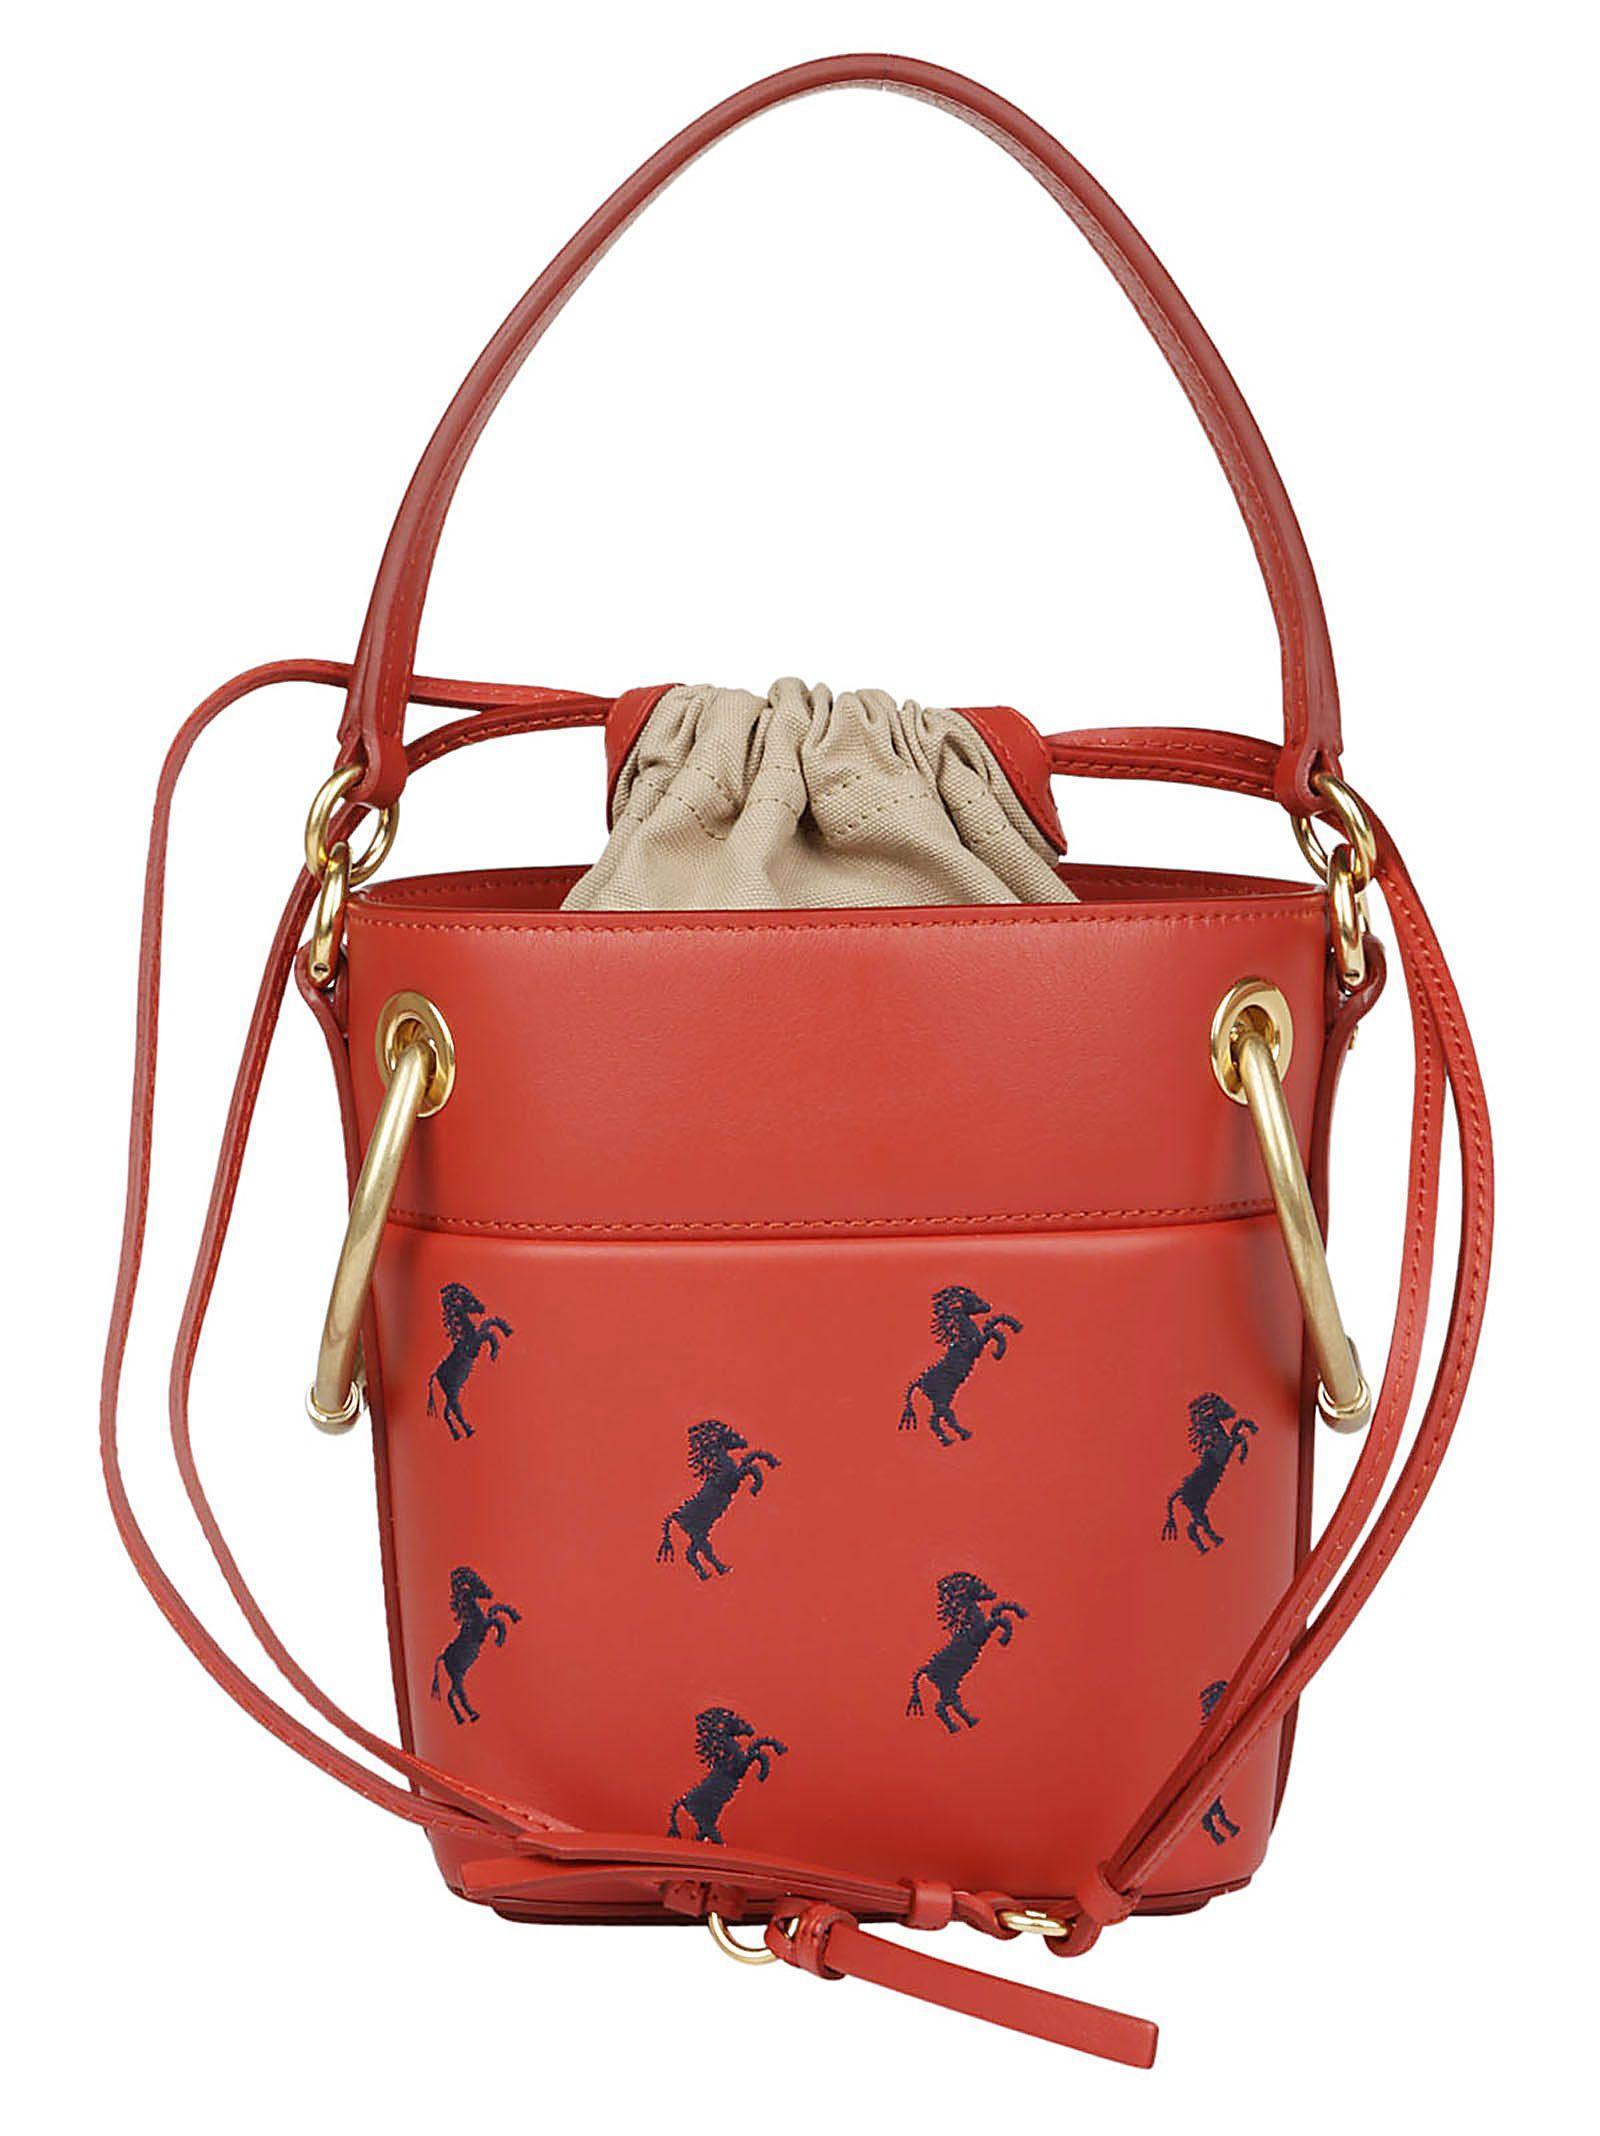 ChloÉ ChloÈ Shoulder Bag In Earthy Red